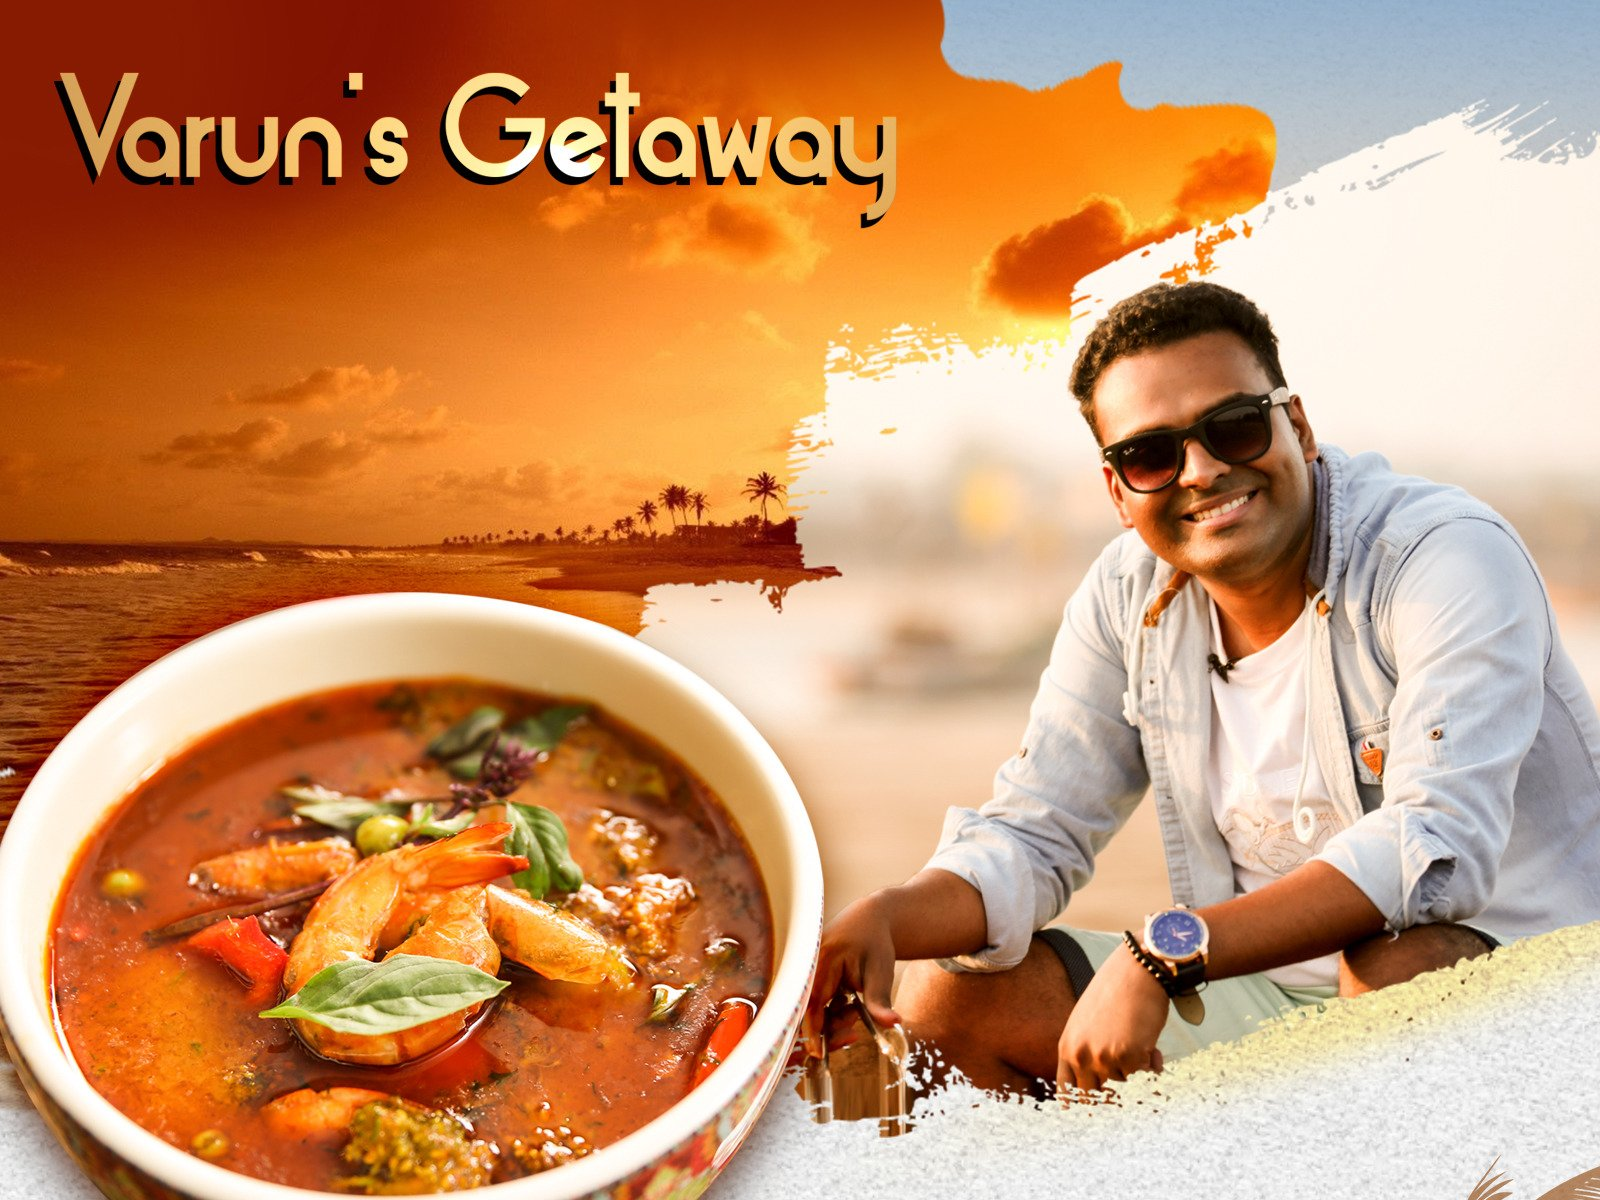 Clip: Varun's Getaway - Season 1